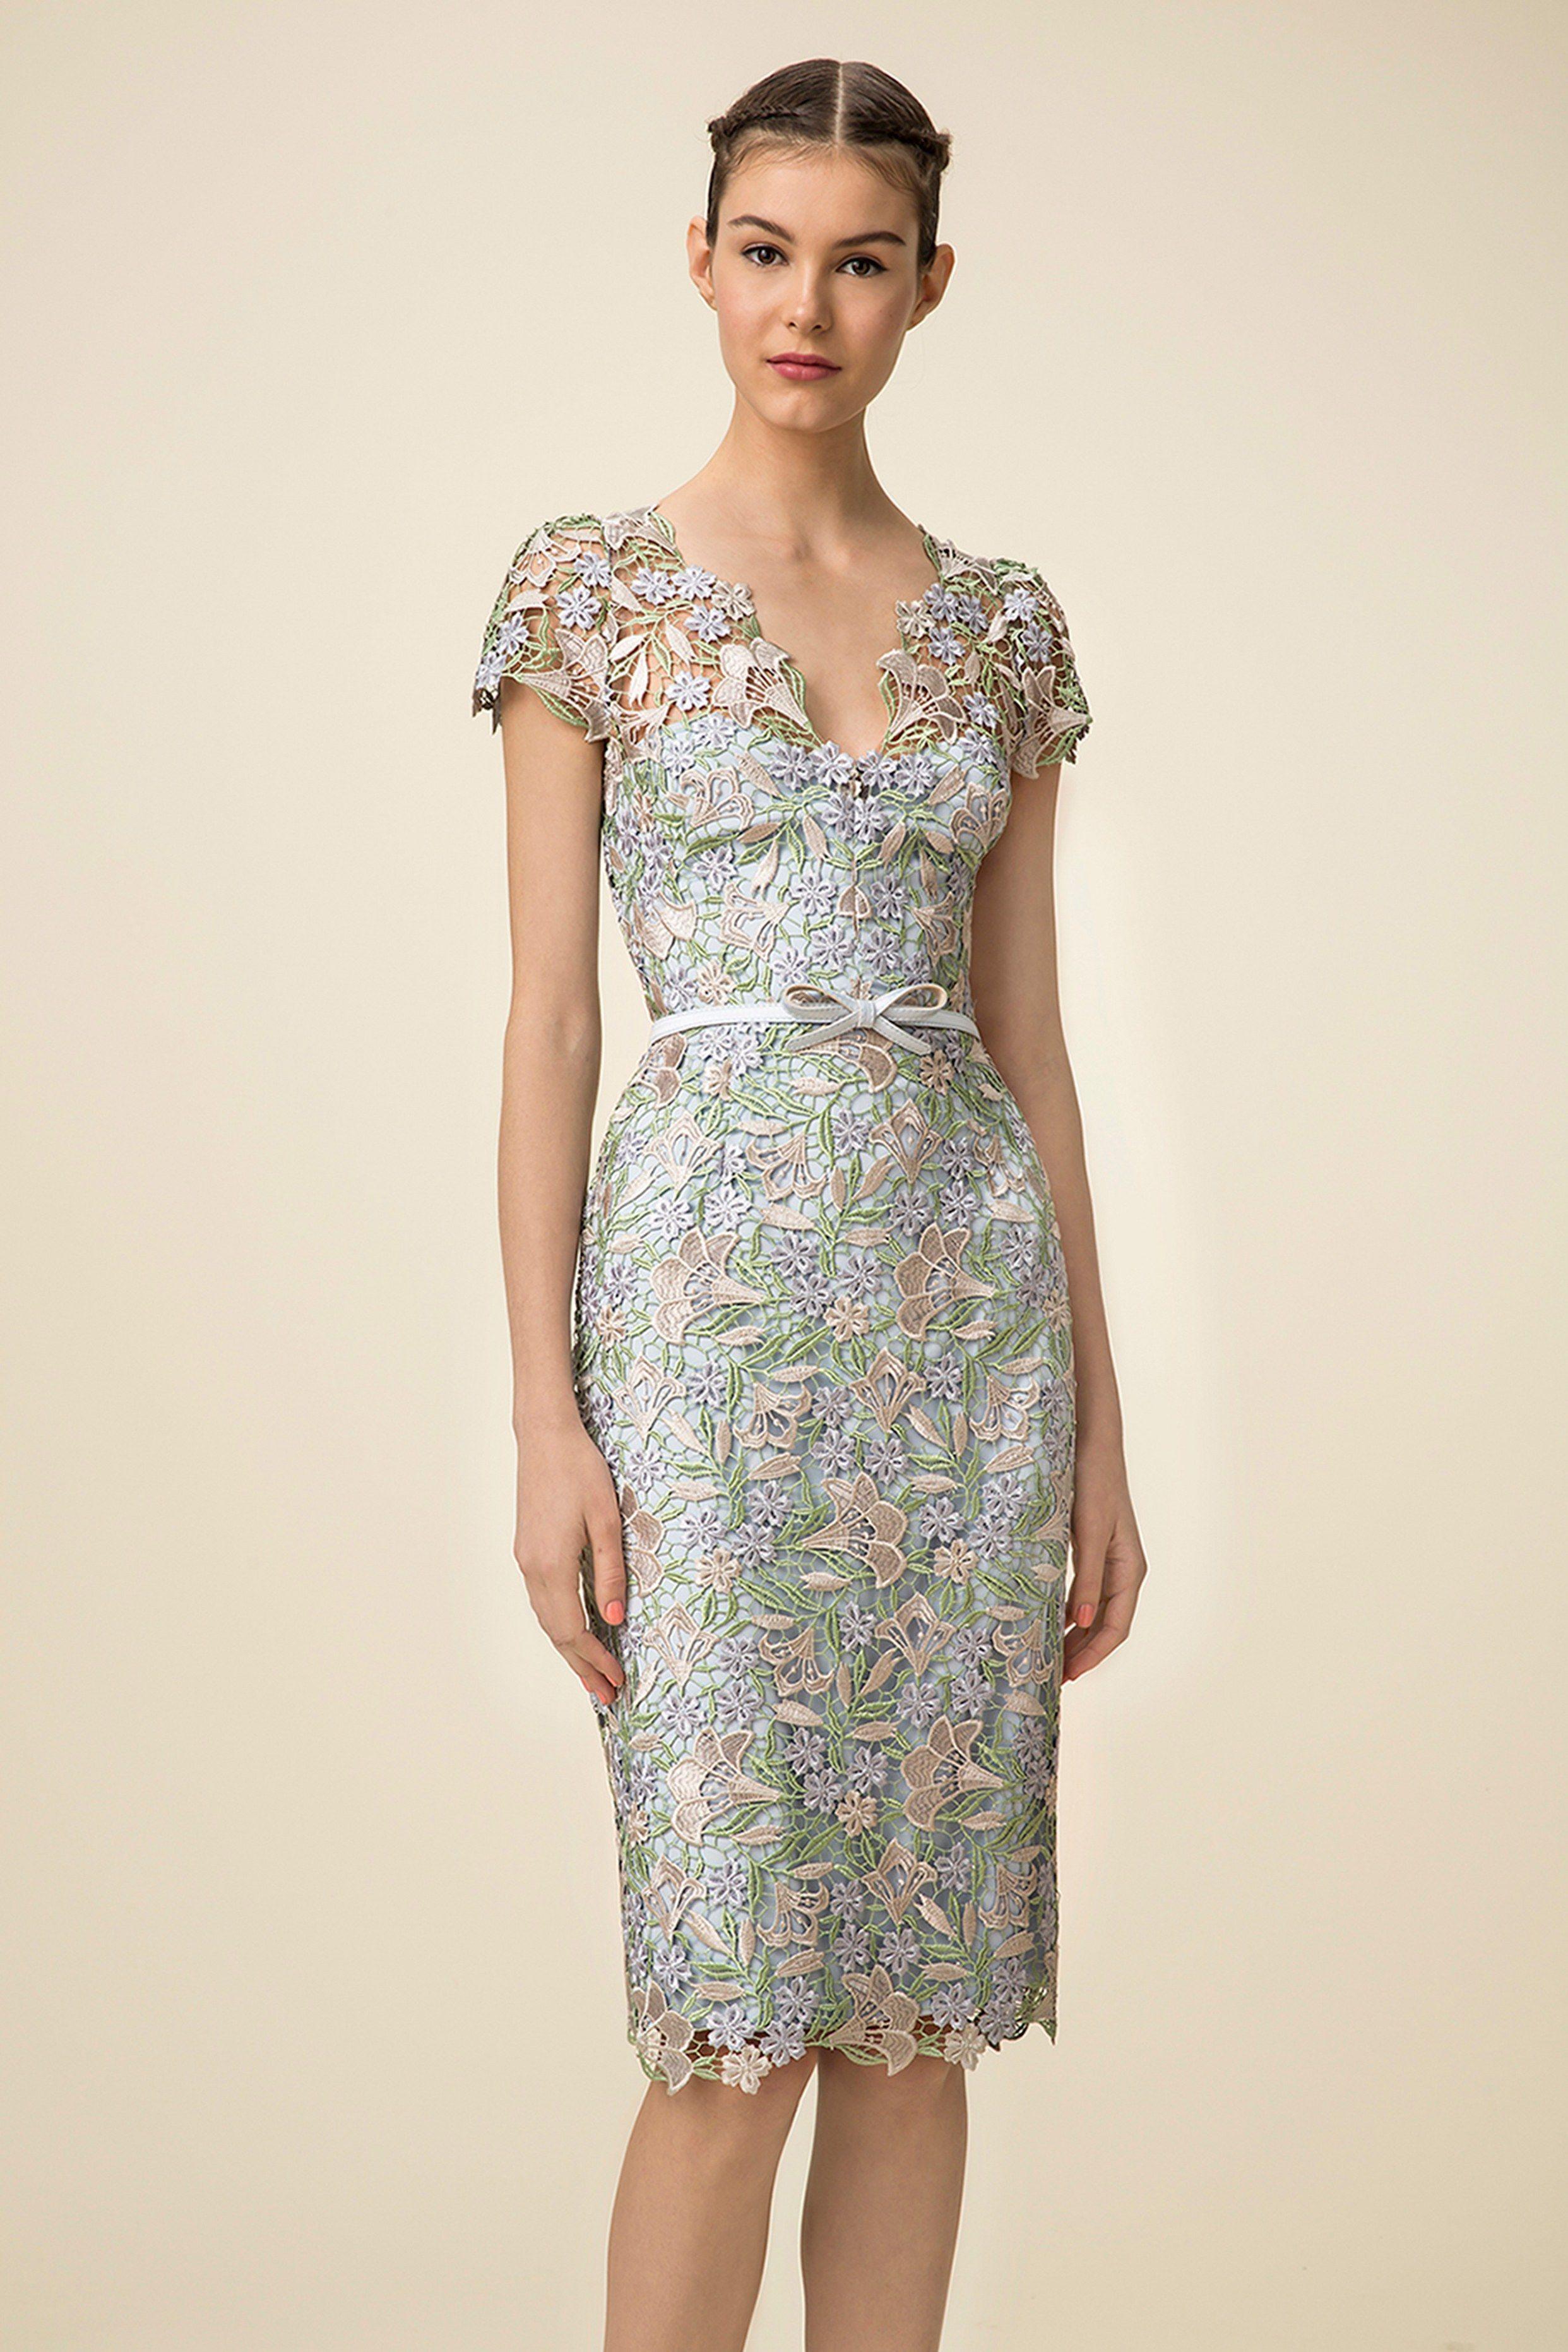 Dress for wedding guest spring  Marchesa Notte Spring  ReadytoWear Fashion Show  The Wedding